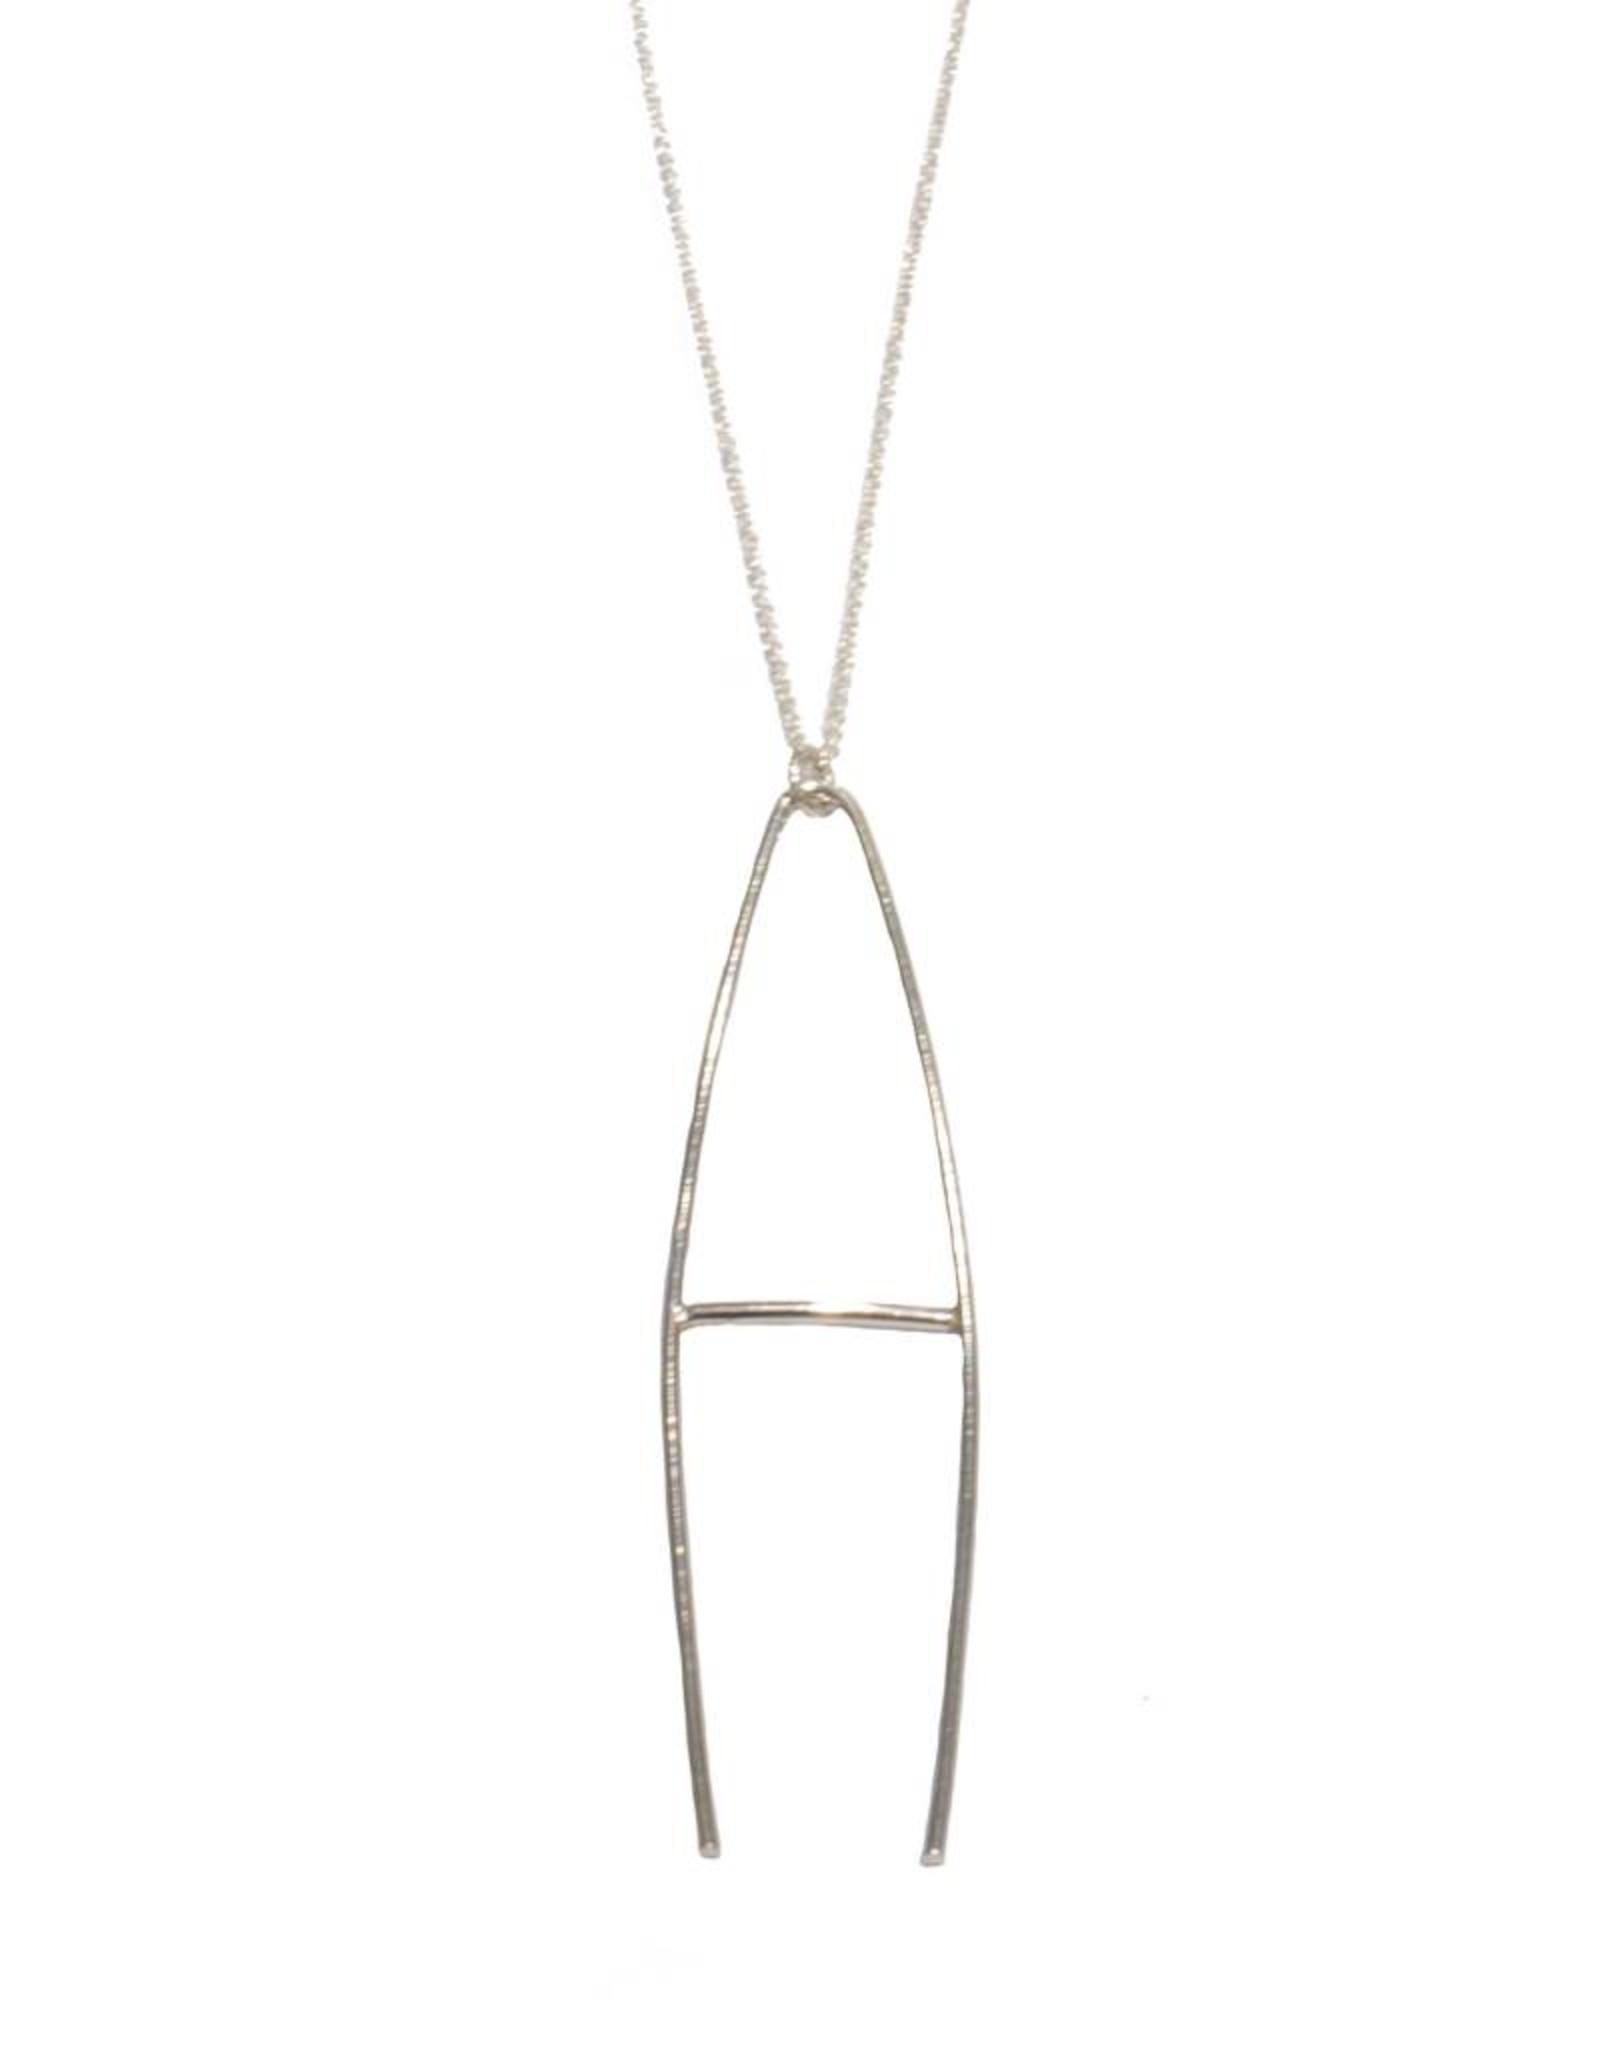 Gauge NYC Luna Letter Necklace - A